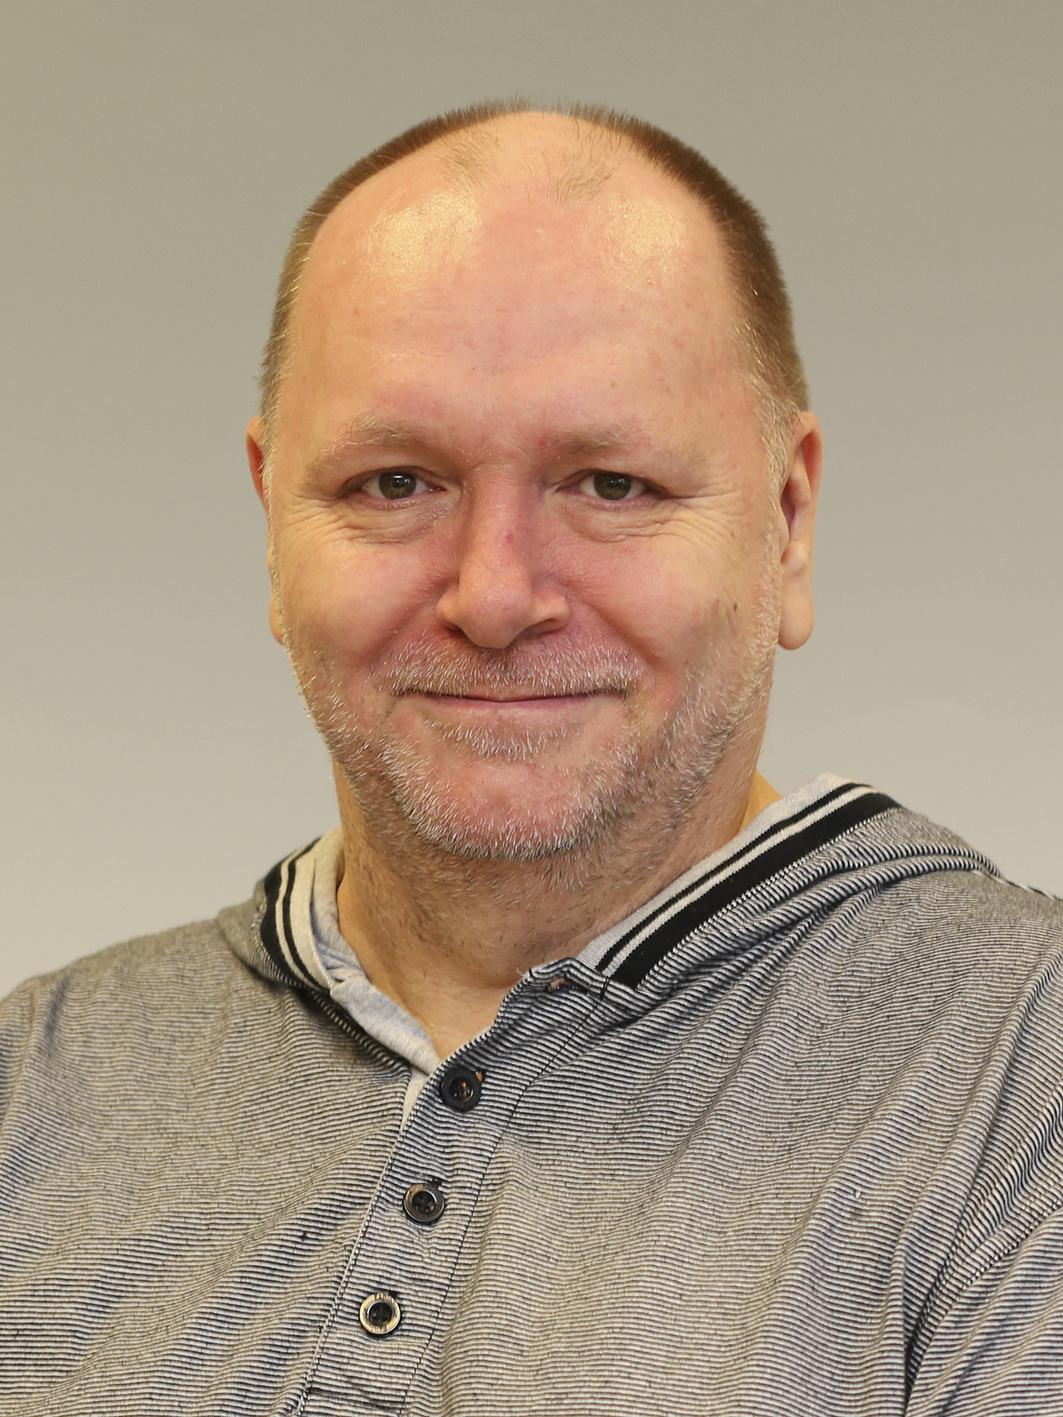 Henrik Barlach